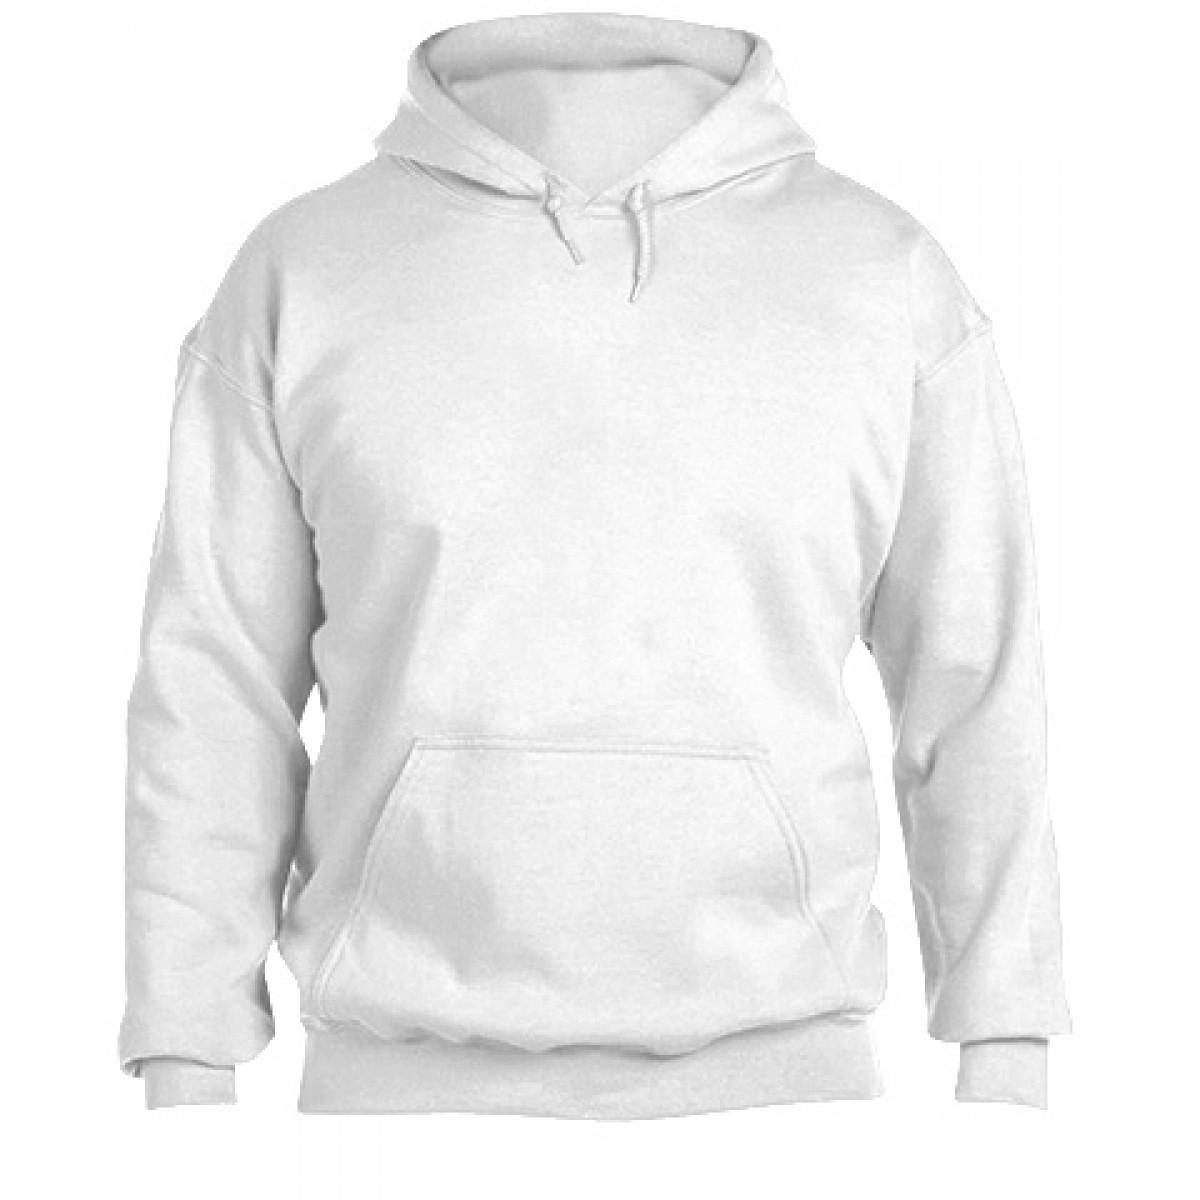 Hooded Sweatshirt 50/50 Heavy Blend -White-S